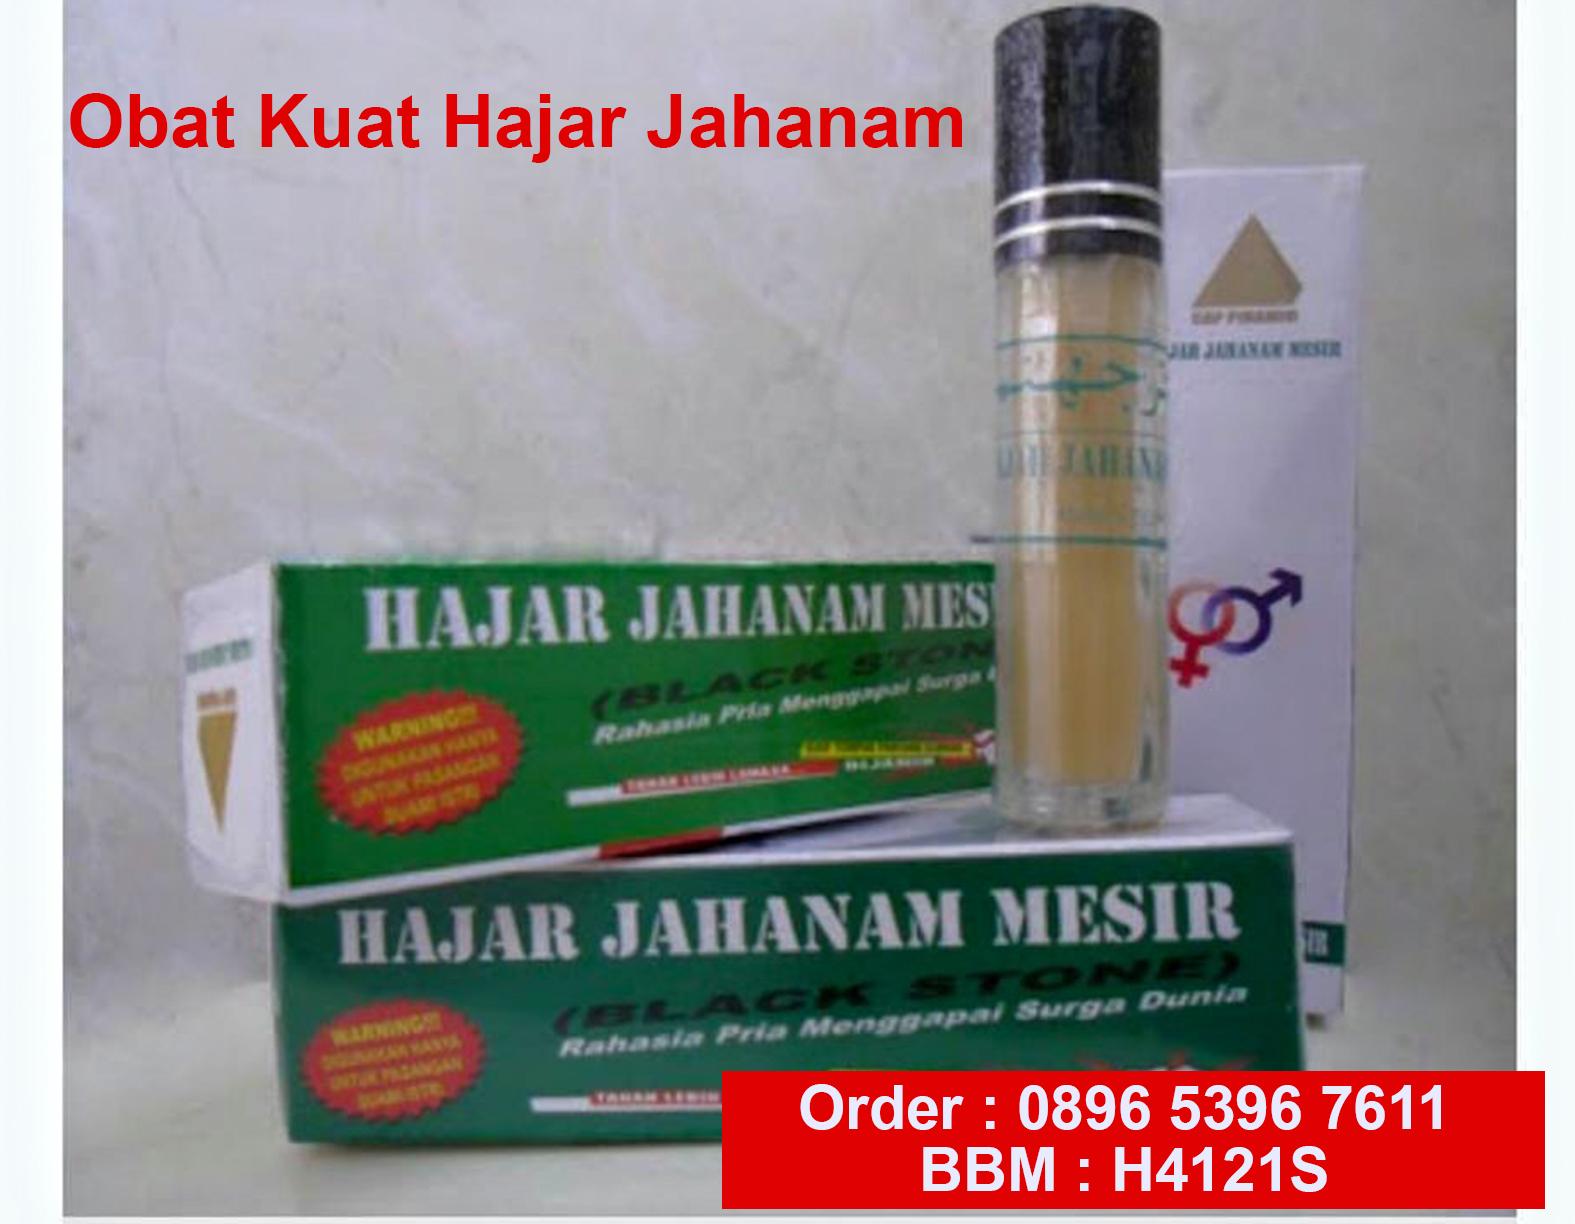 Hajar Jahanam Asli Mesir Di Surabaya 0896 5396 7611 Obat Kuat Oles Hj Dicari Agen Untuk Memasarkan Produk Ini